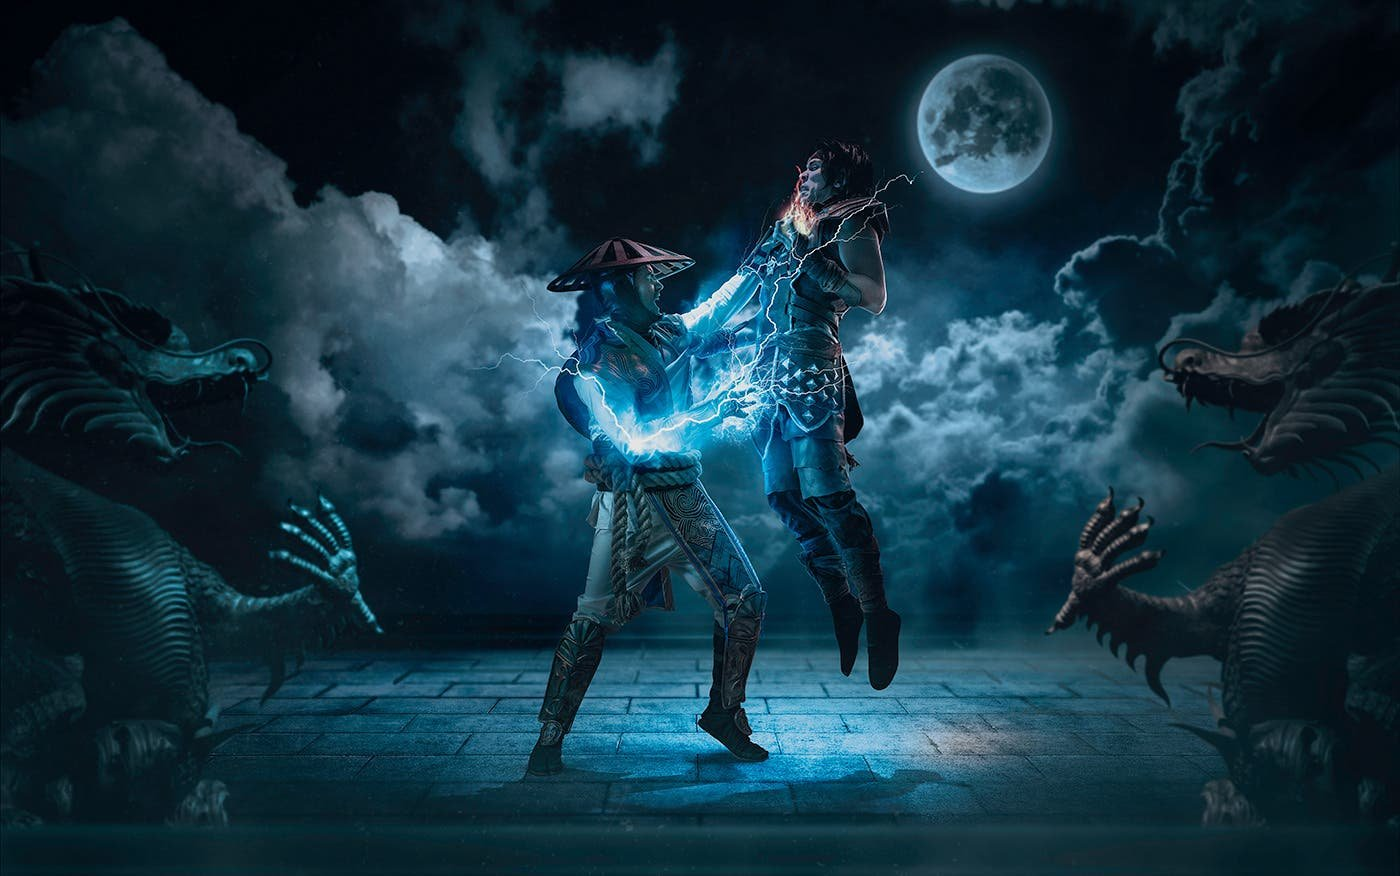 Mortal Kombat Cosplay Photos Show Creative Process from Photography to Digital Art